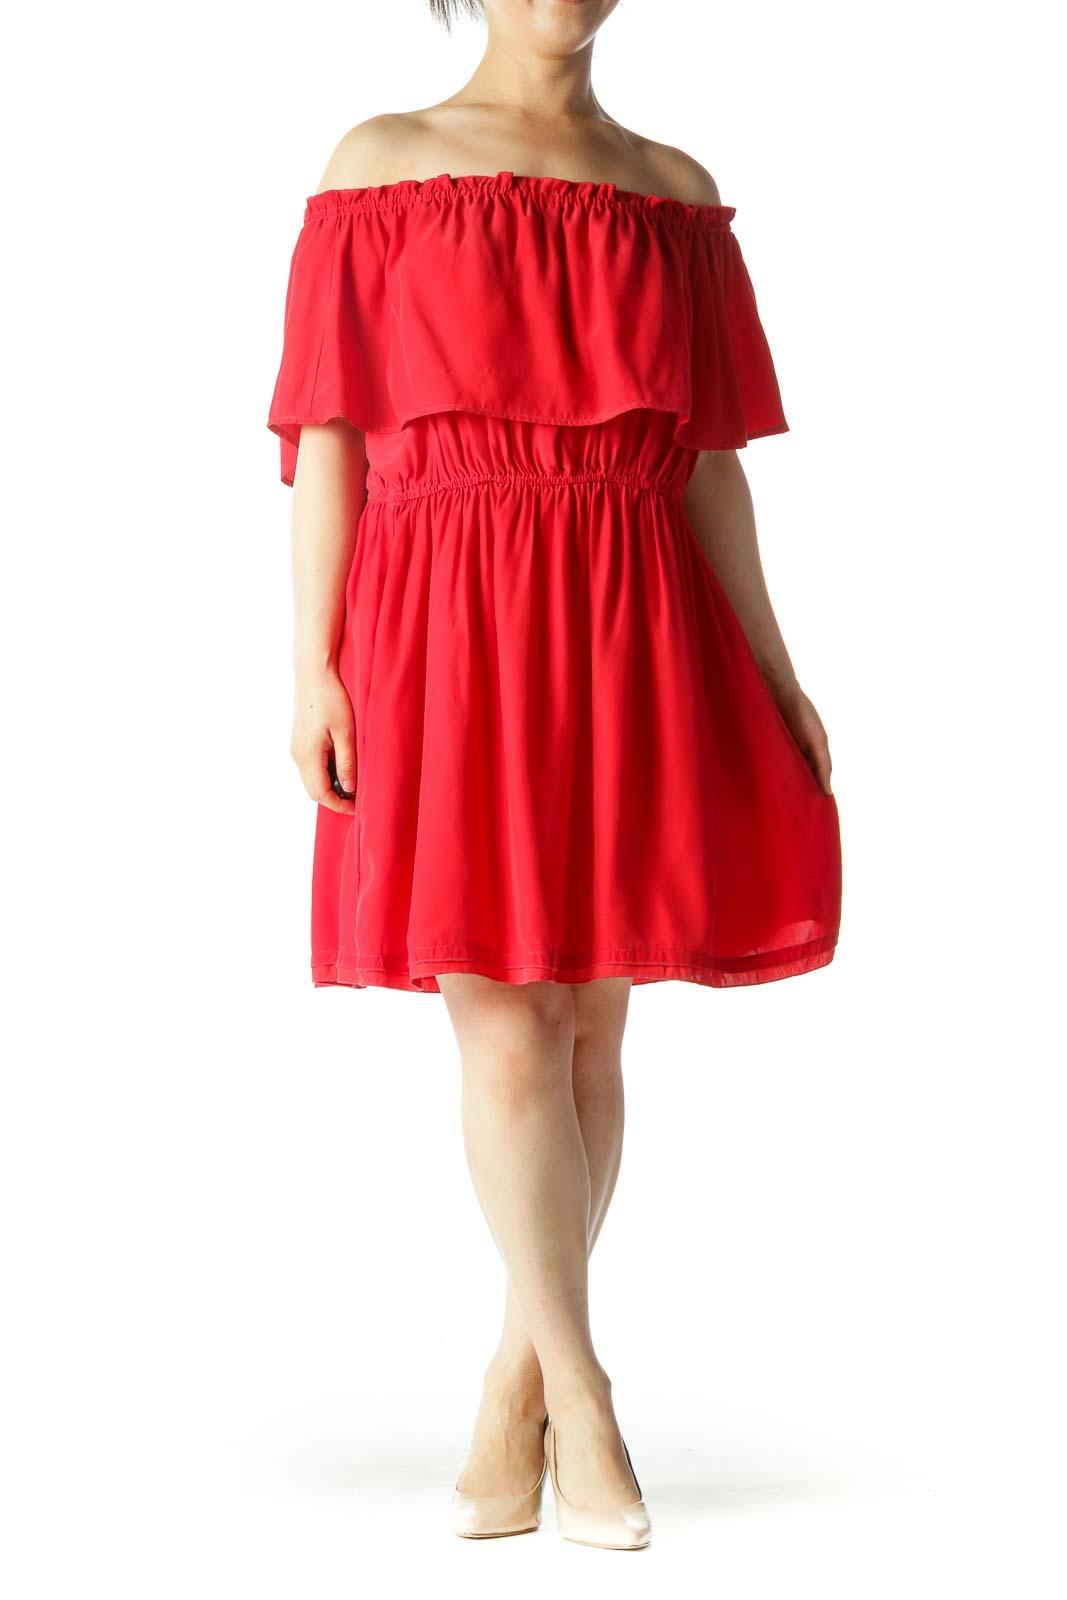 Red 100% Silk Cold Shoulder Elastic Waist Pocketed Day Dress